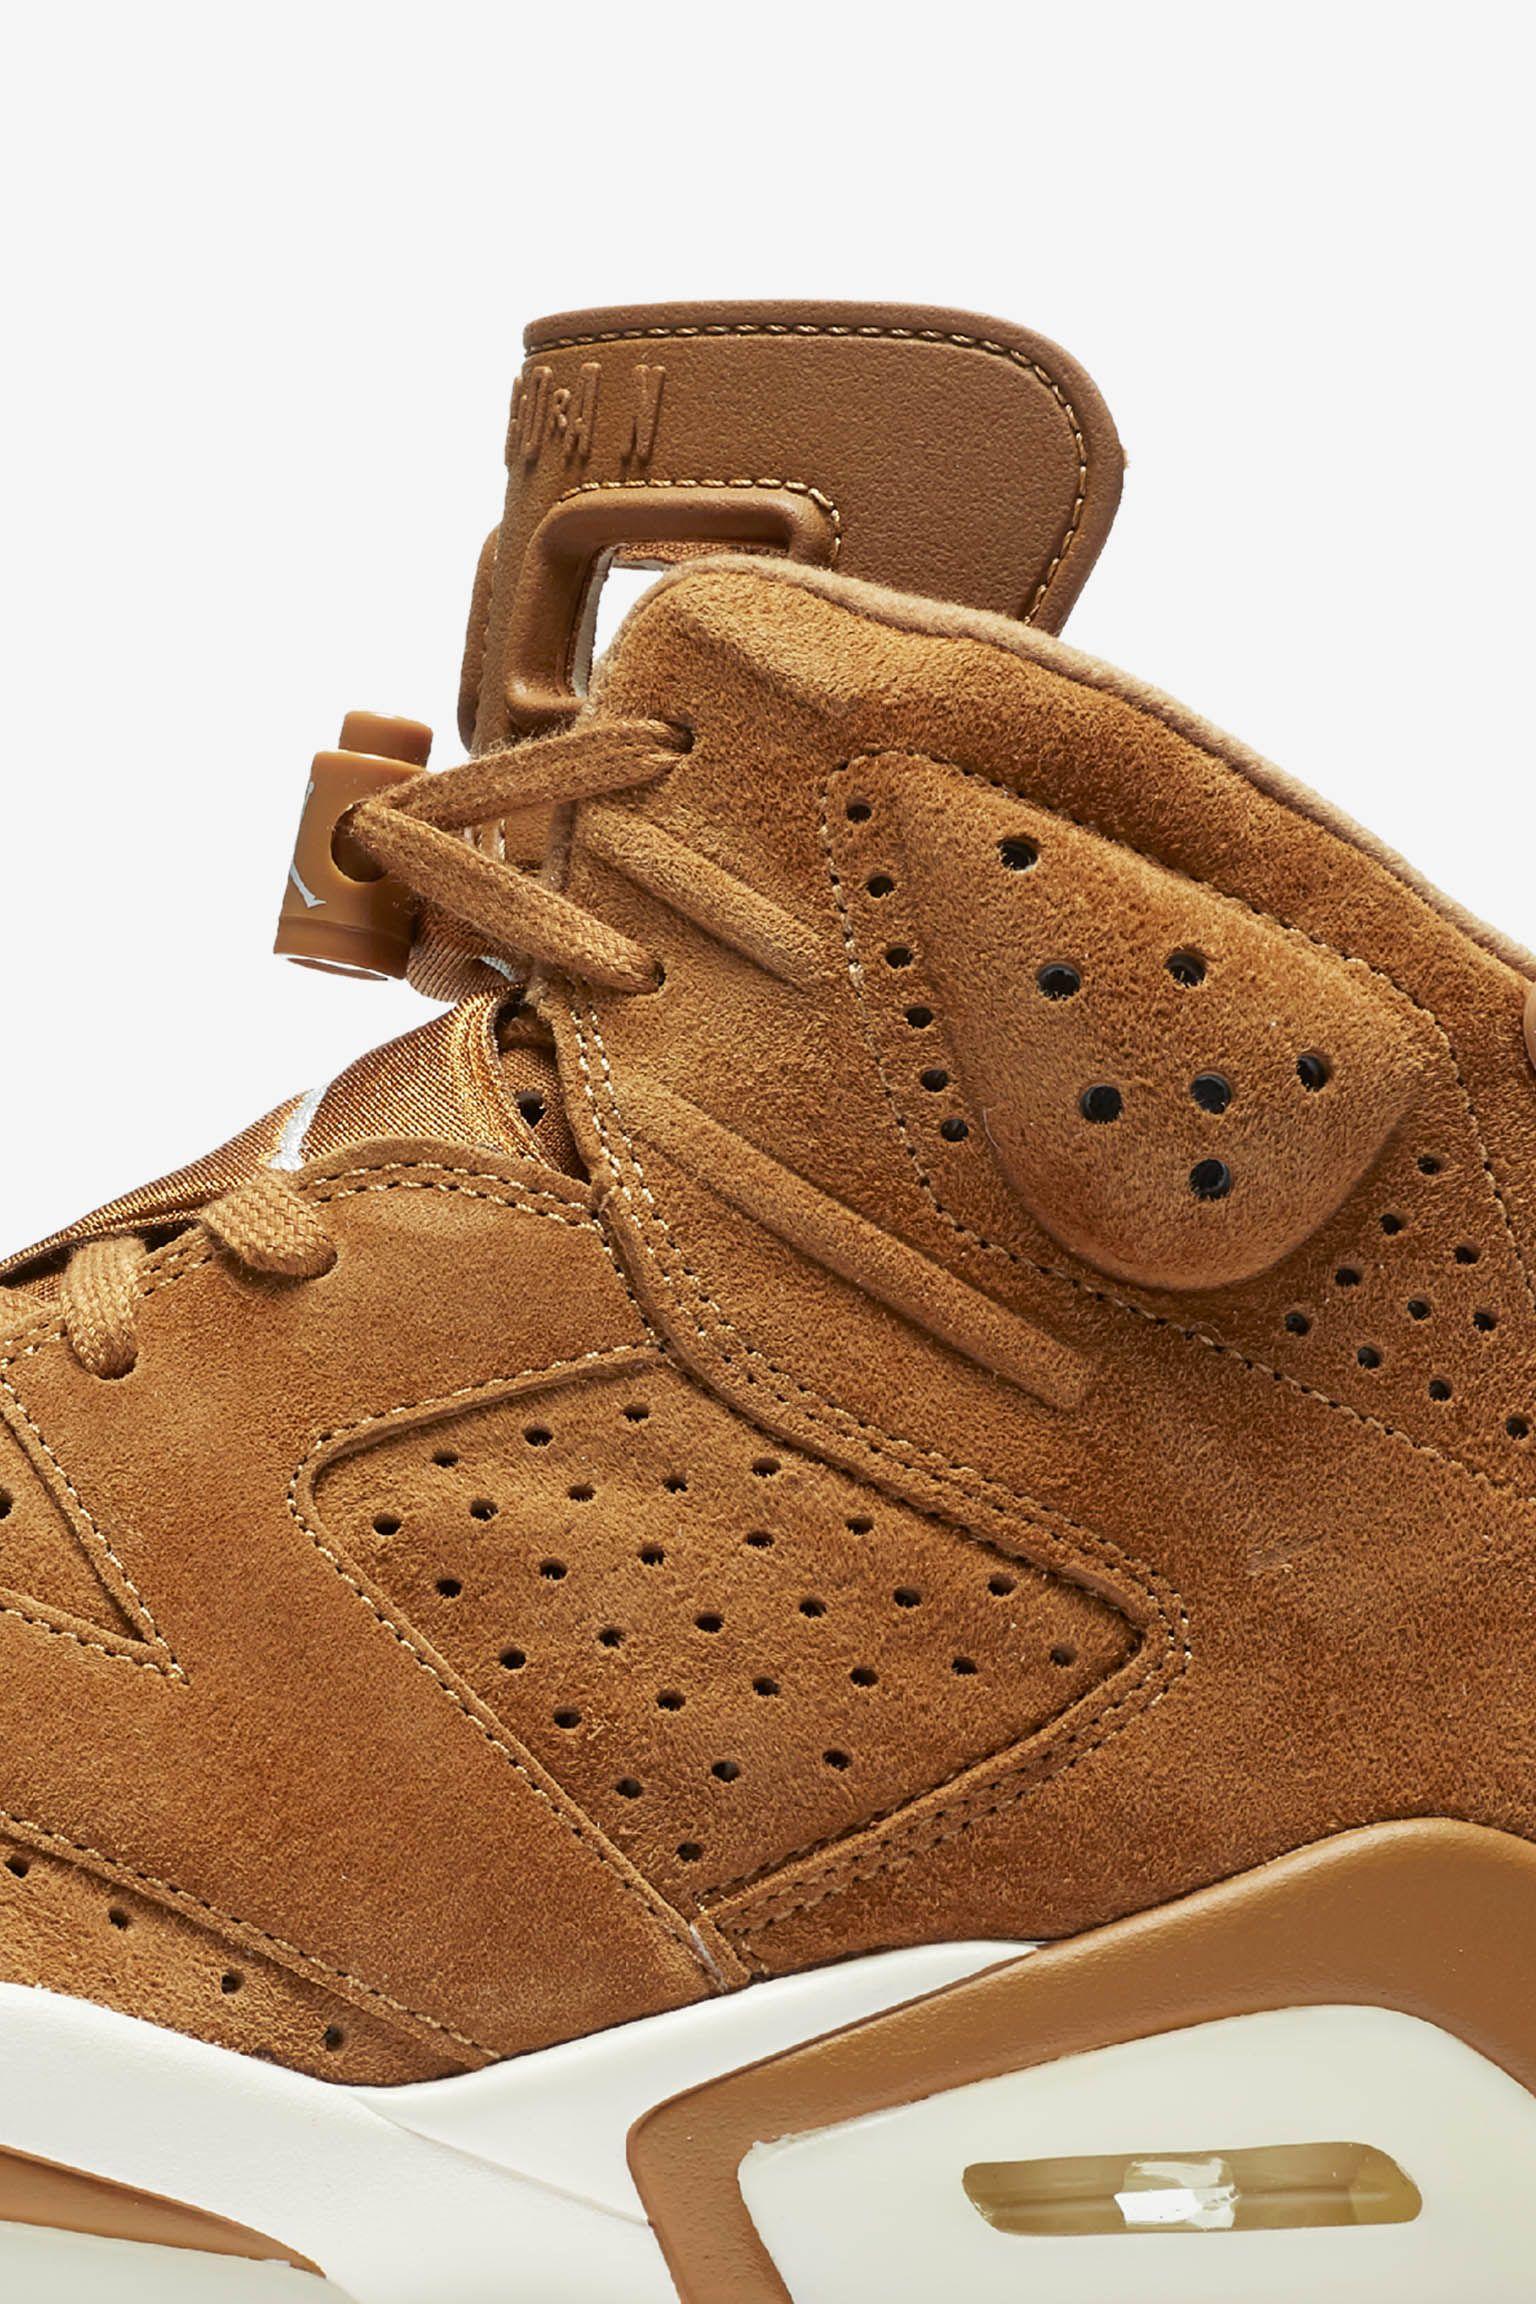 Air Jordan 6 'Wheat' Release Date